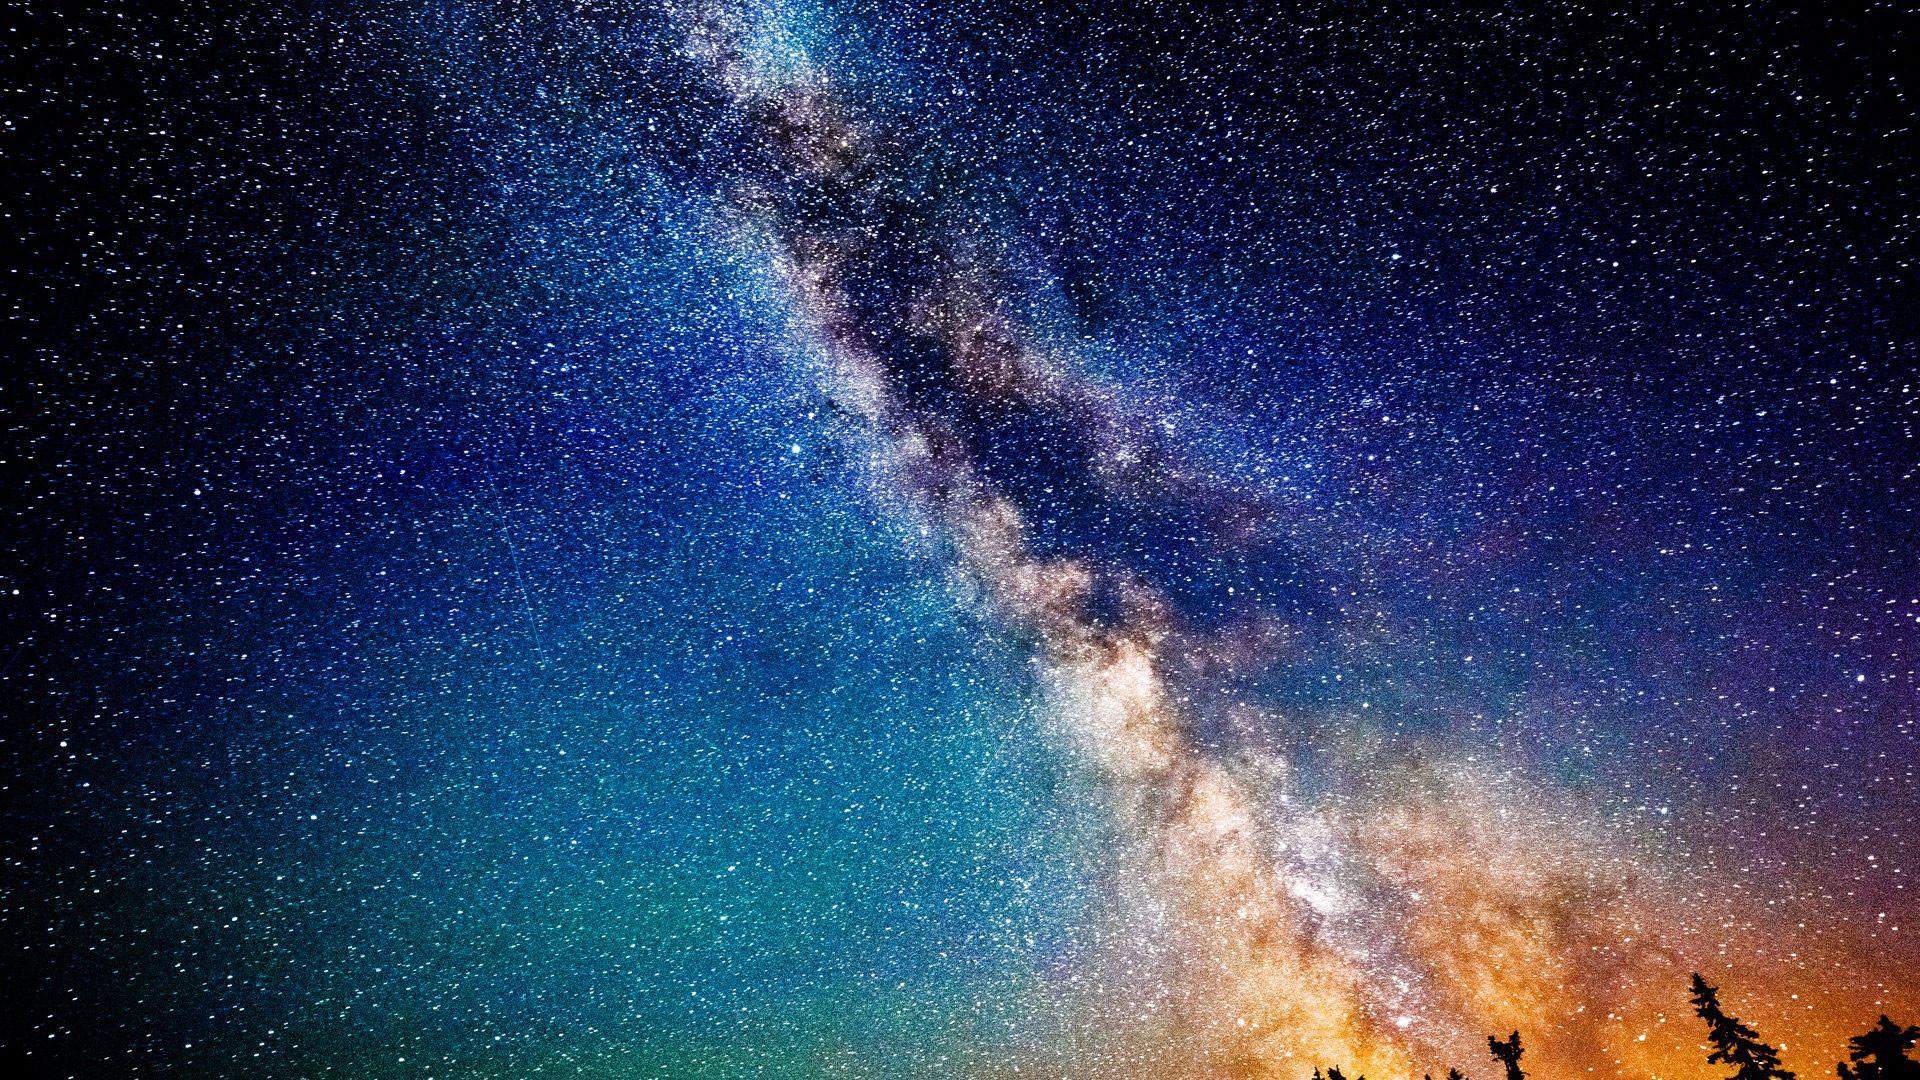 hd pics photos space nebula stars night 10 desktop background wallpaper